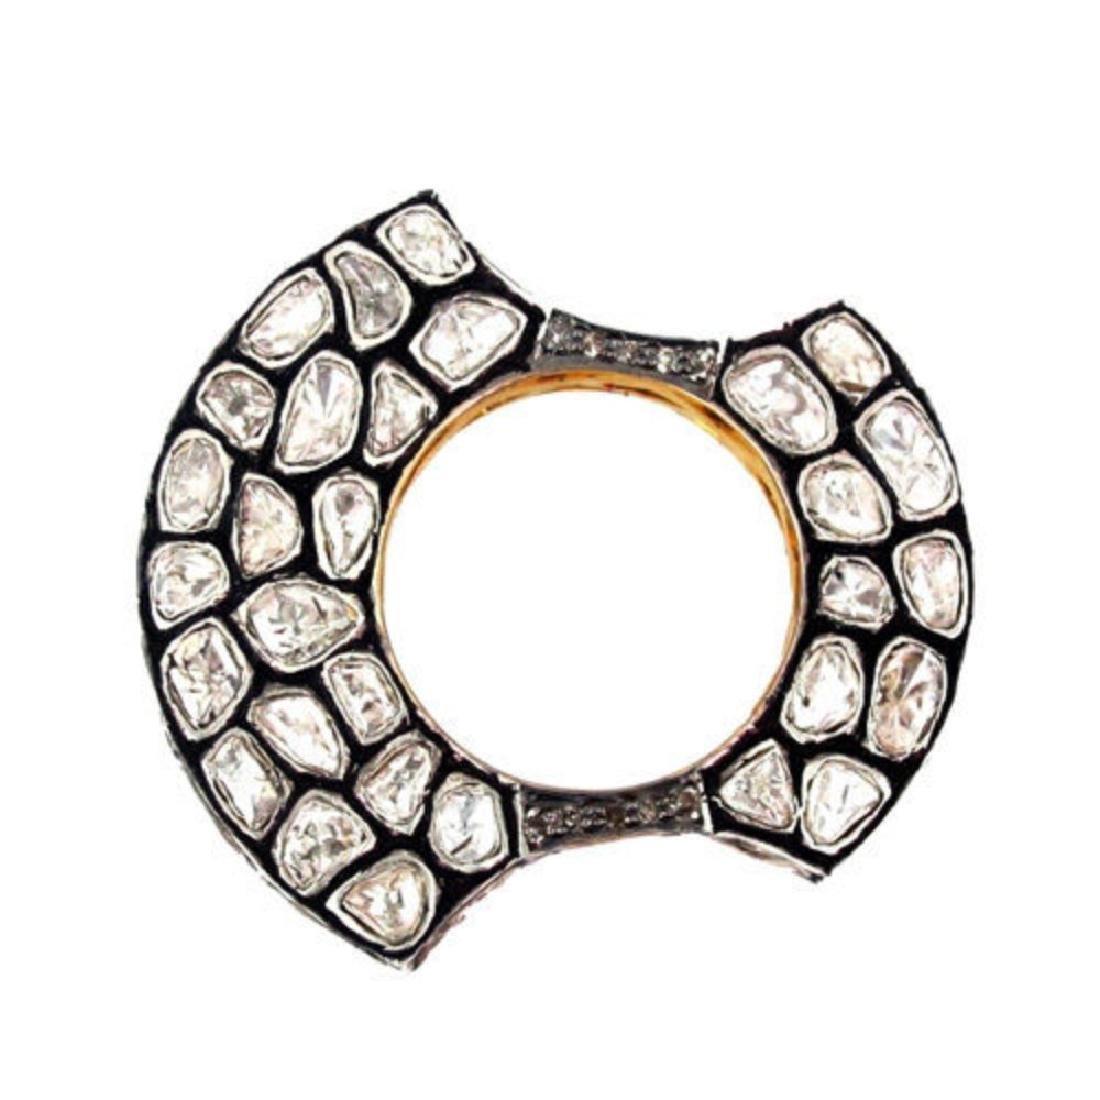 4.70ct Rose Cut Diamond Pave. 14K gold Ring - 2